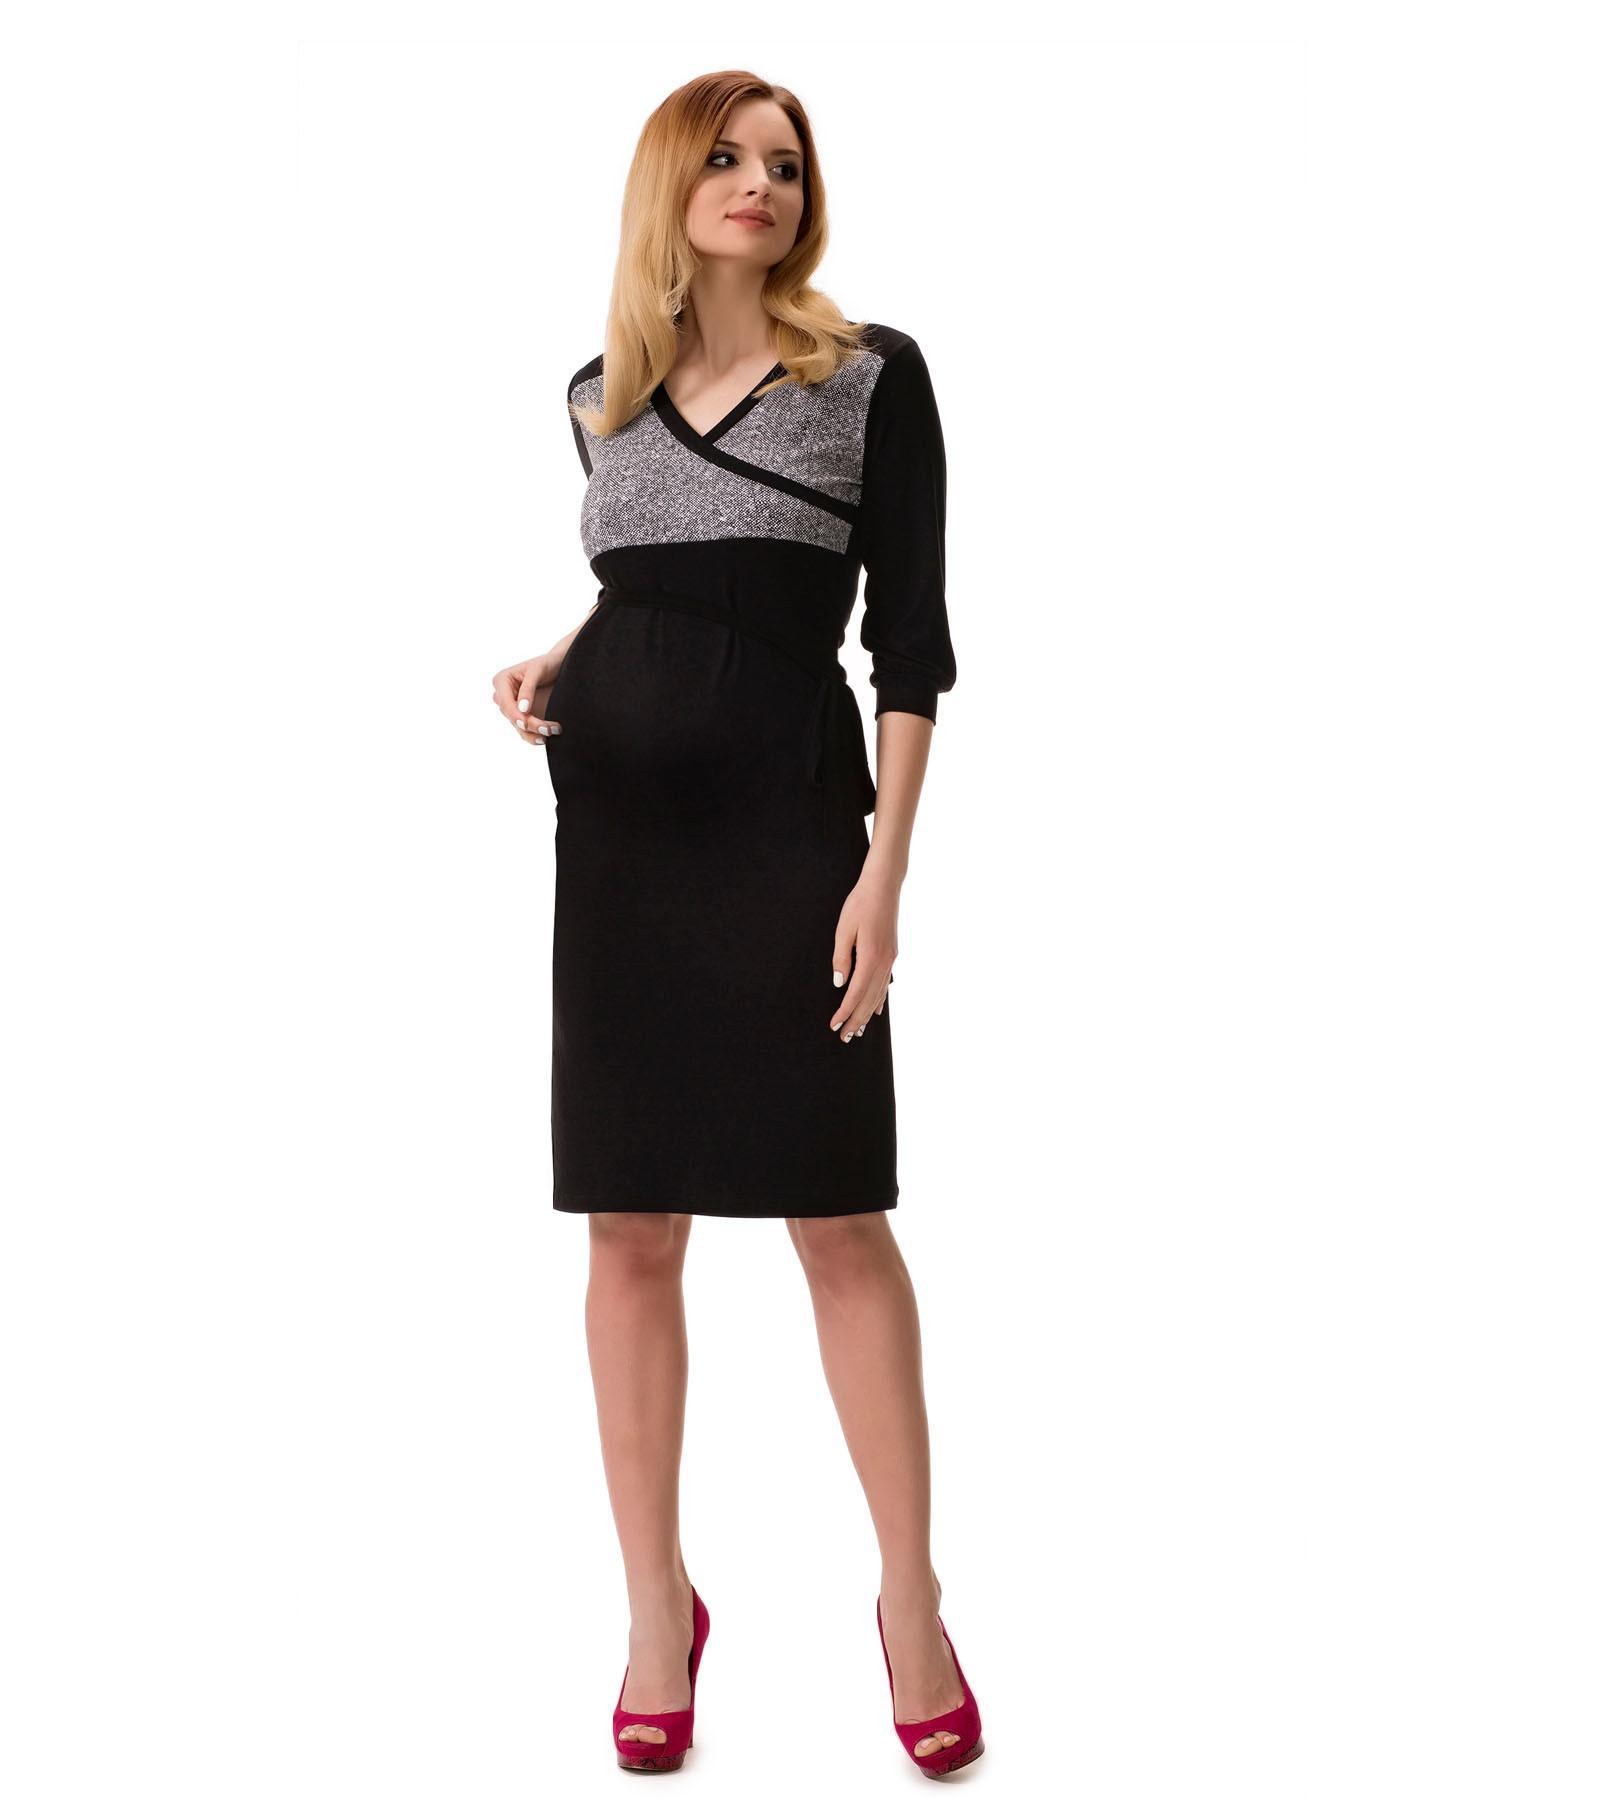 Sukienka ciążowa Oliwia Bensini